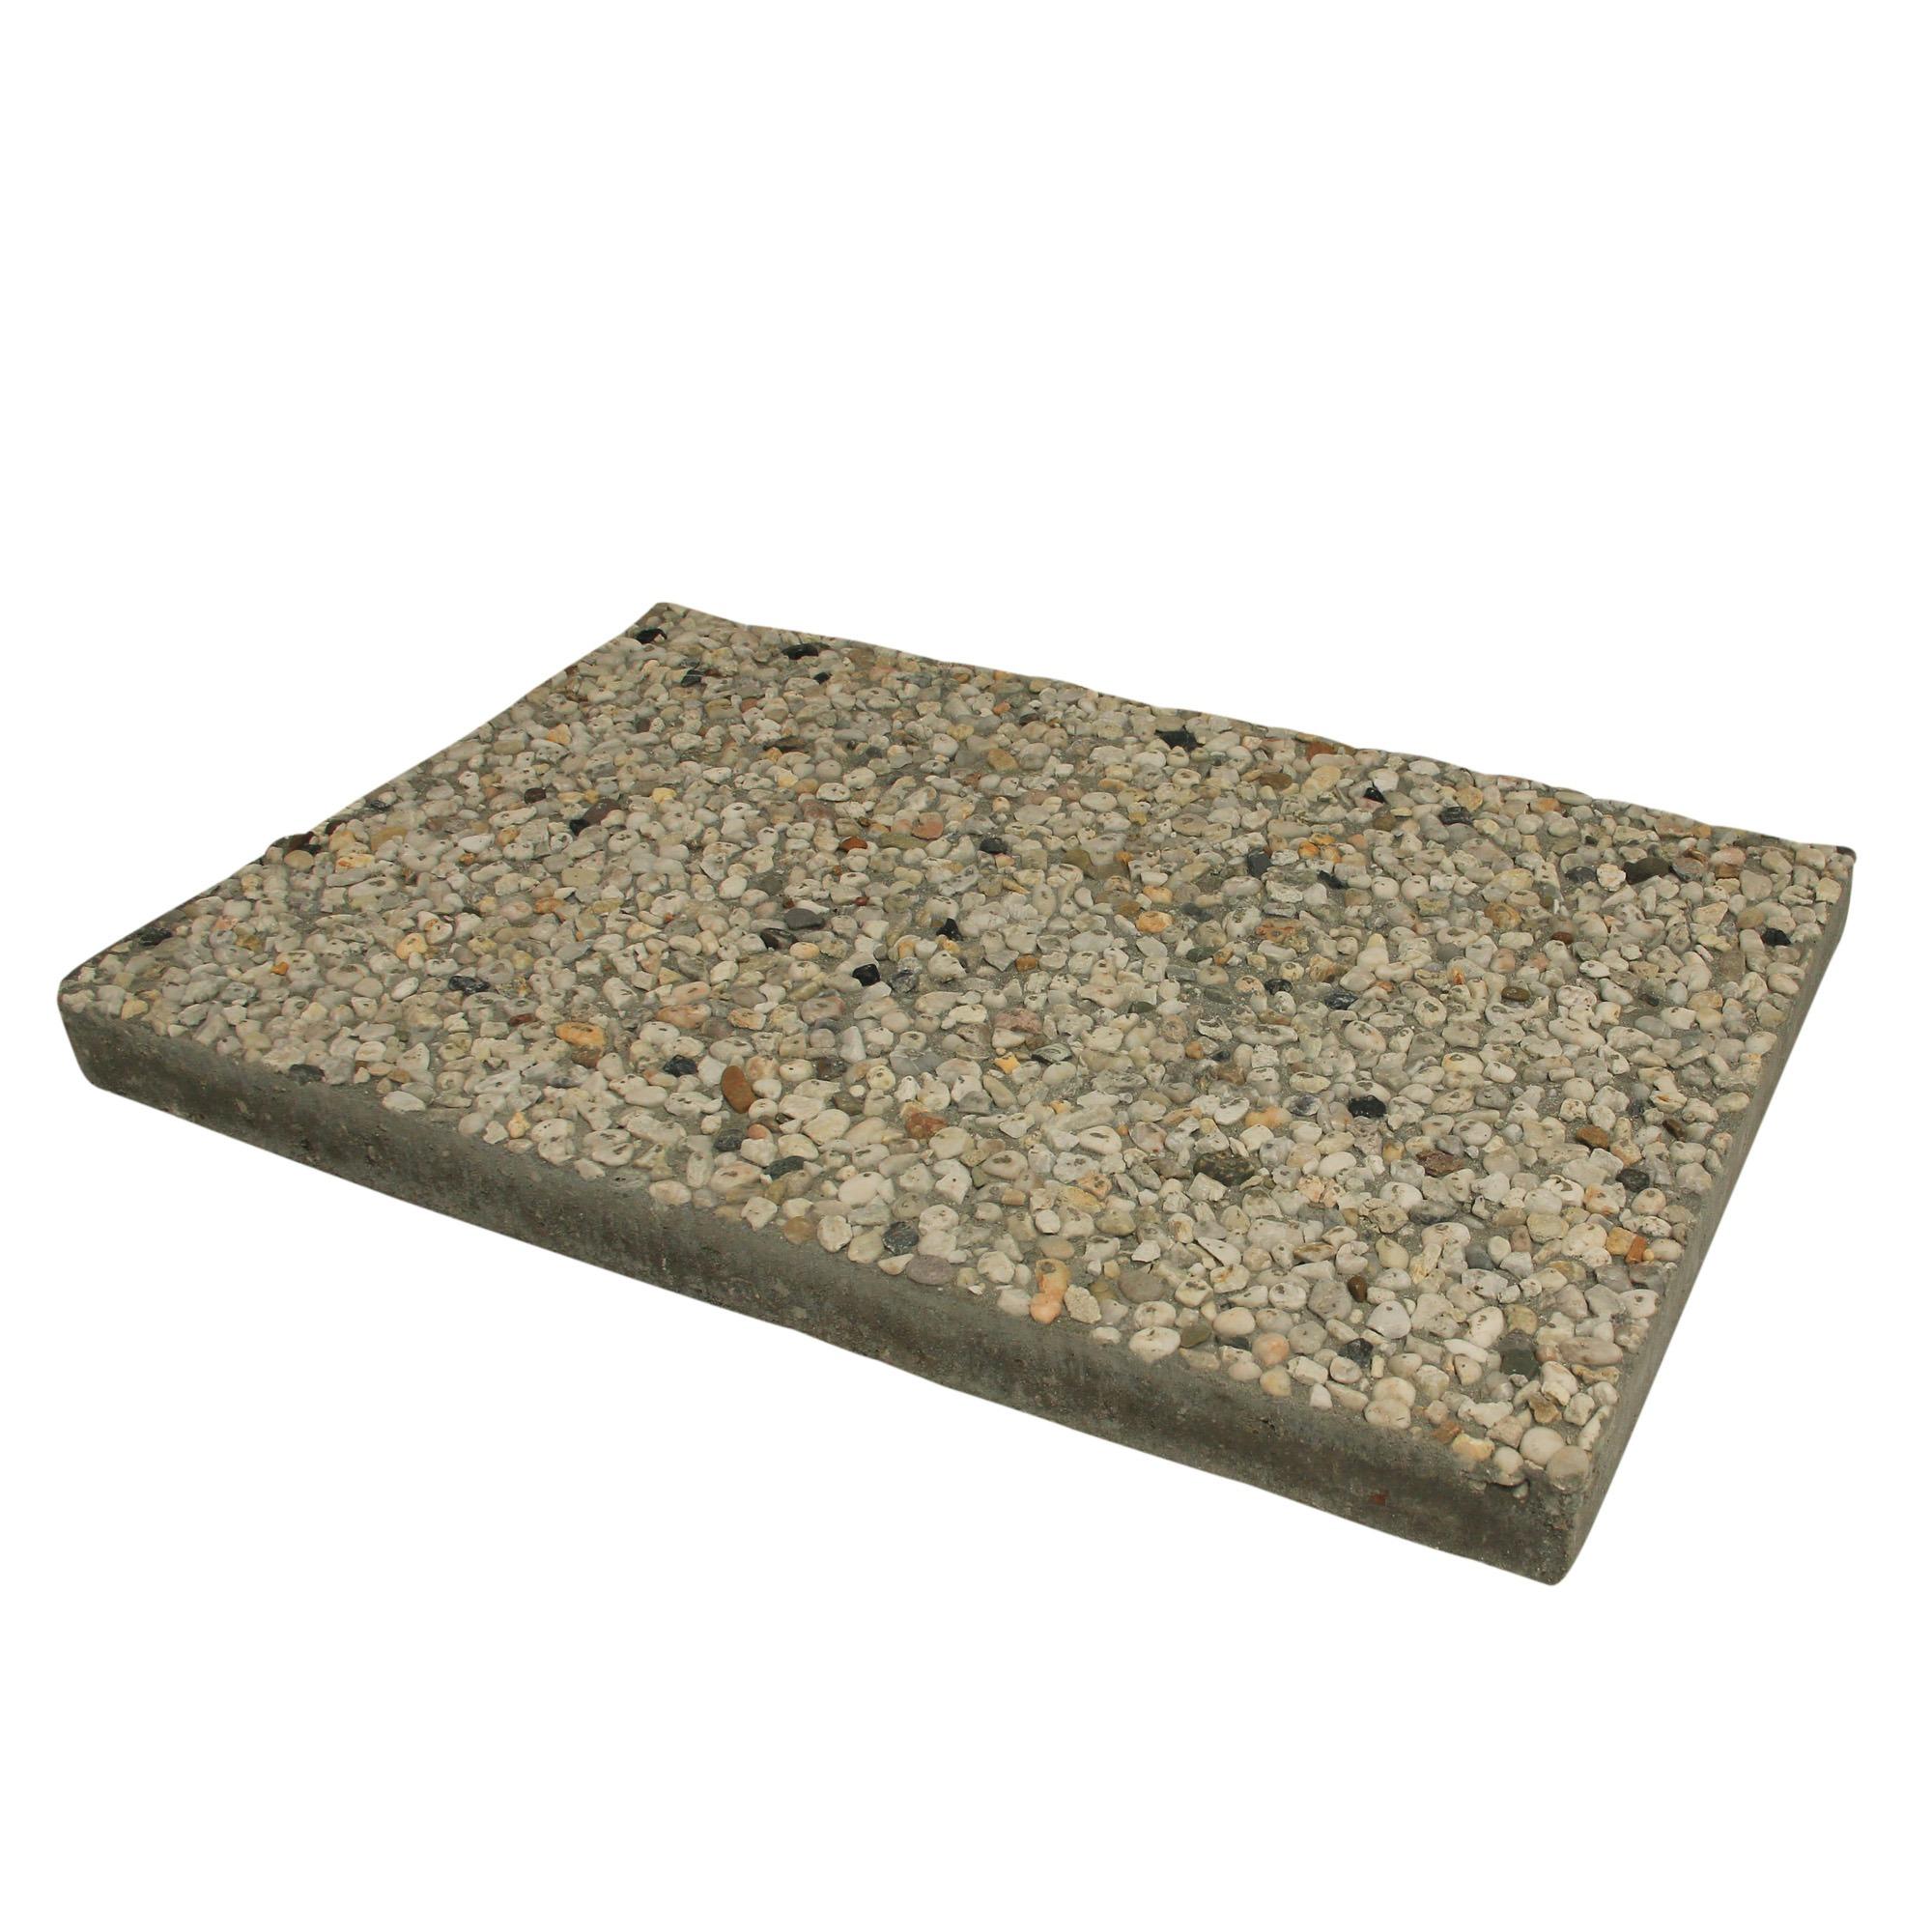 Grindtegel Wit/Geel 60x40 cm - 50 Tegels - 12,0 m2